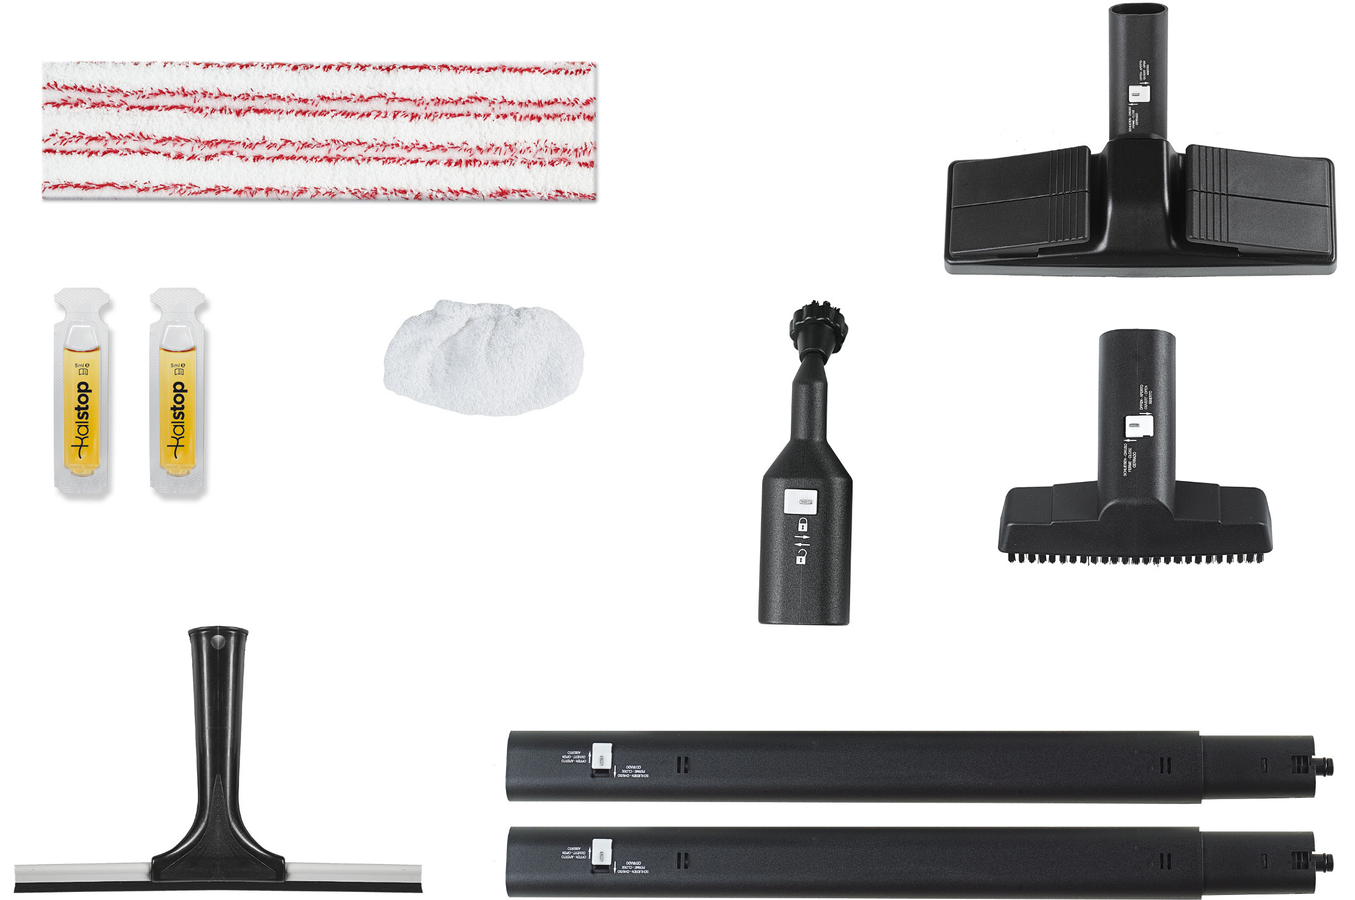 nettoyeur vapeur polti vaporetto pro 80 4156889 darty. Black Bedroom Furniture Sets. Home Design Ideas